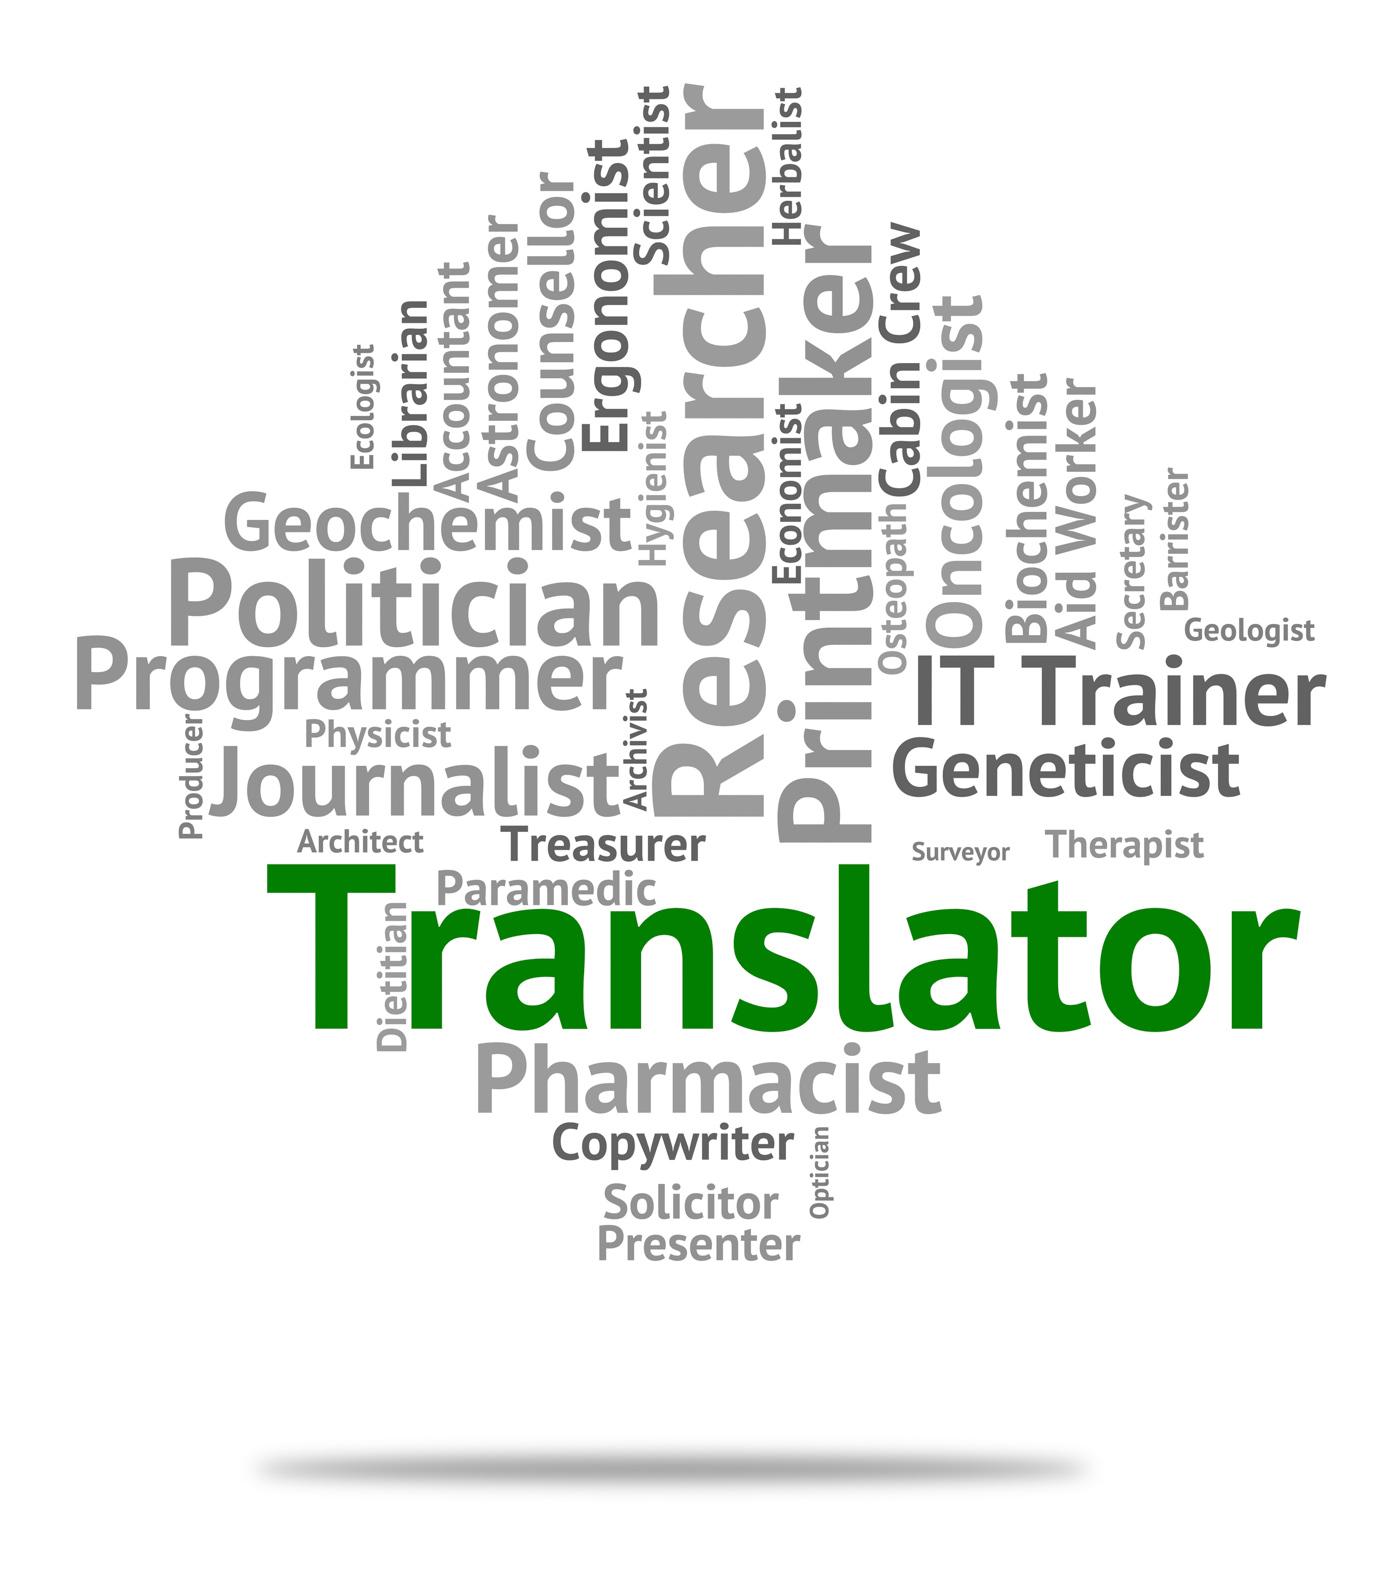 Translator job means translates decipherer and word photo